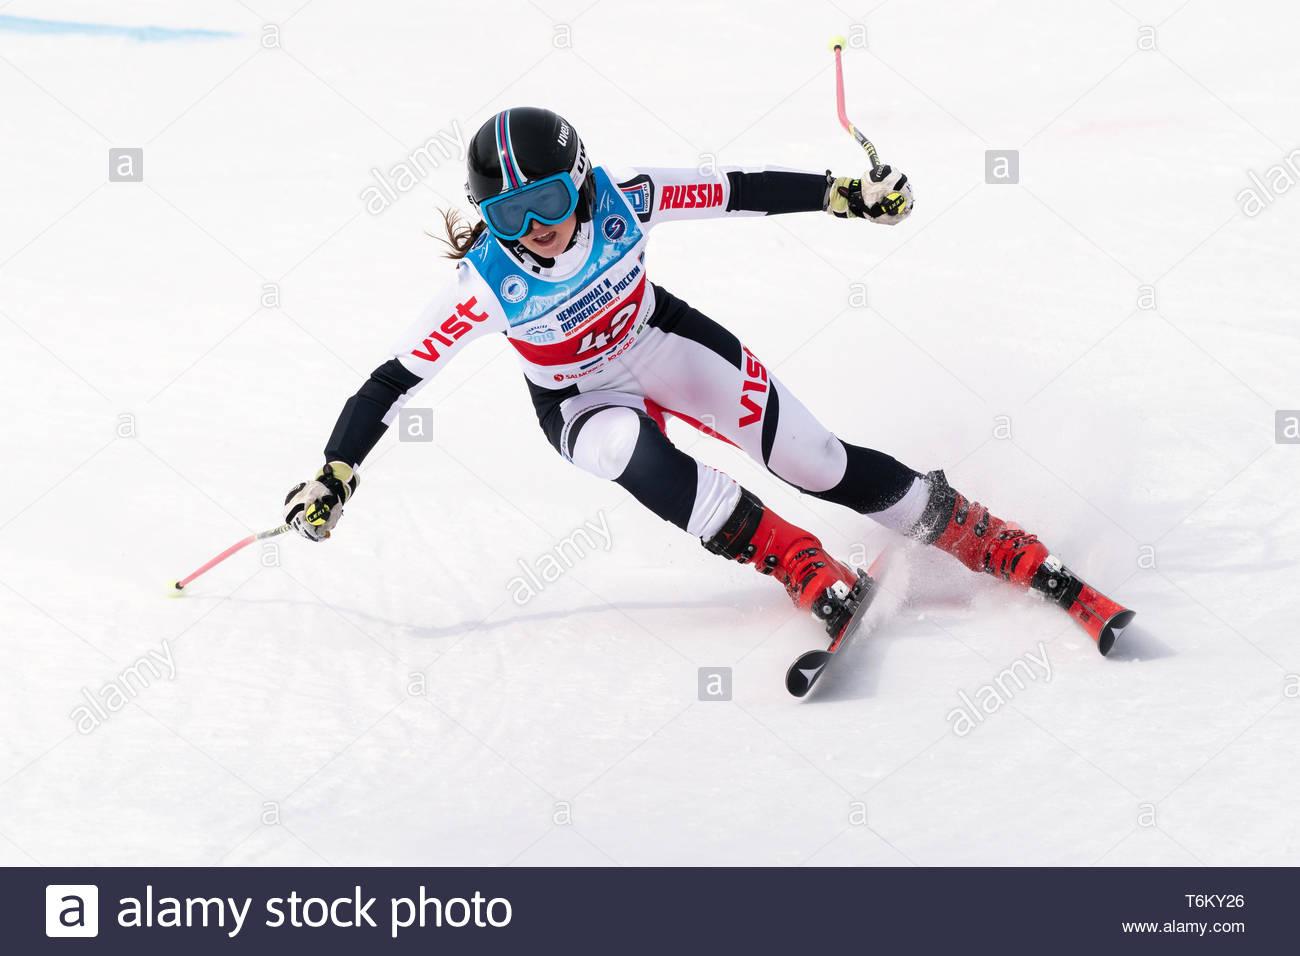 KAMCHATKA PENINSULA, RUSSIA - APR 2, 2019: Mountain skier Dyachenko Ellina (Sakhalin) skiing down mount slope. Russian Women's Alpine Skiing Cup, Inte - Stock Image